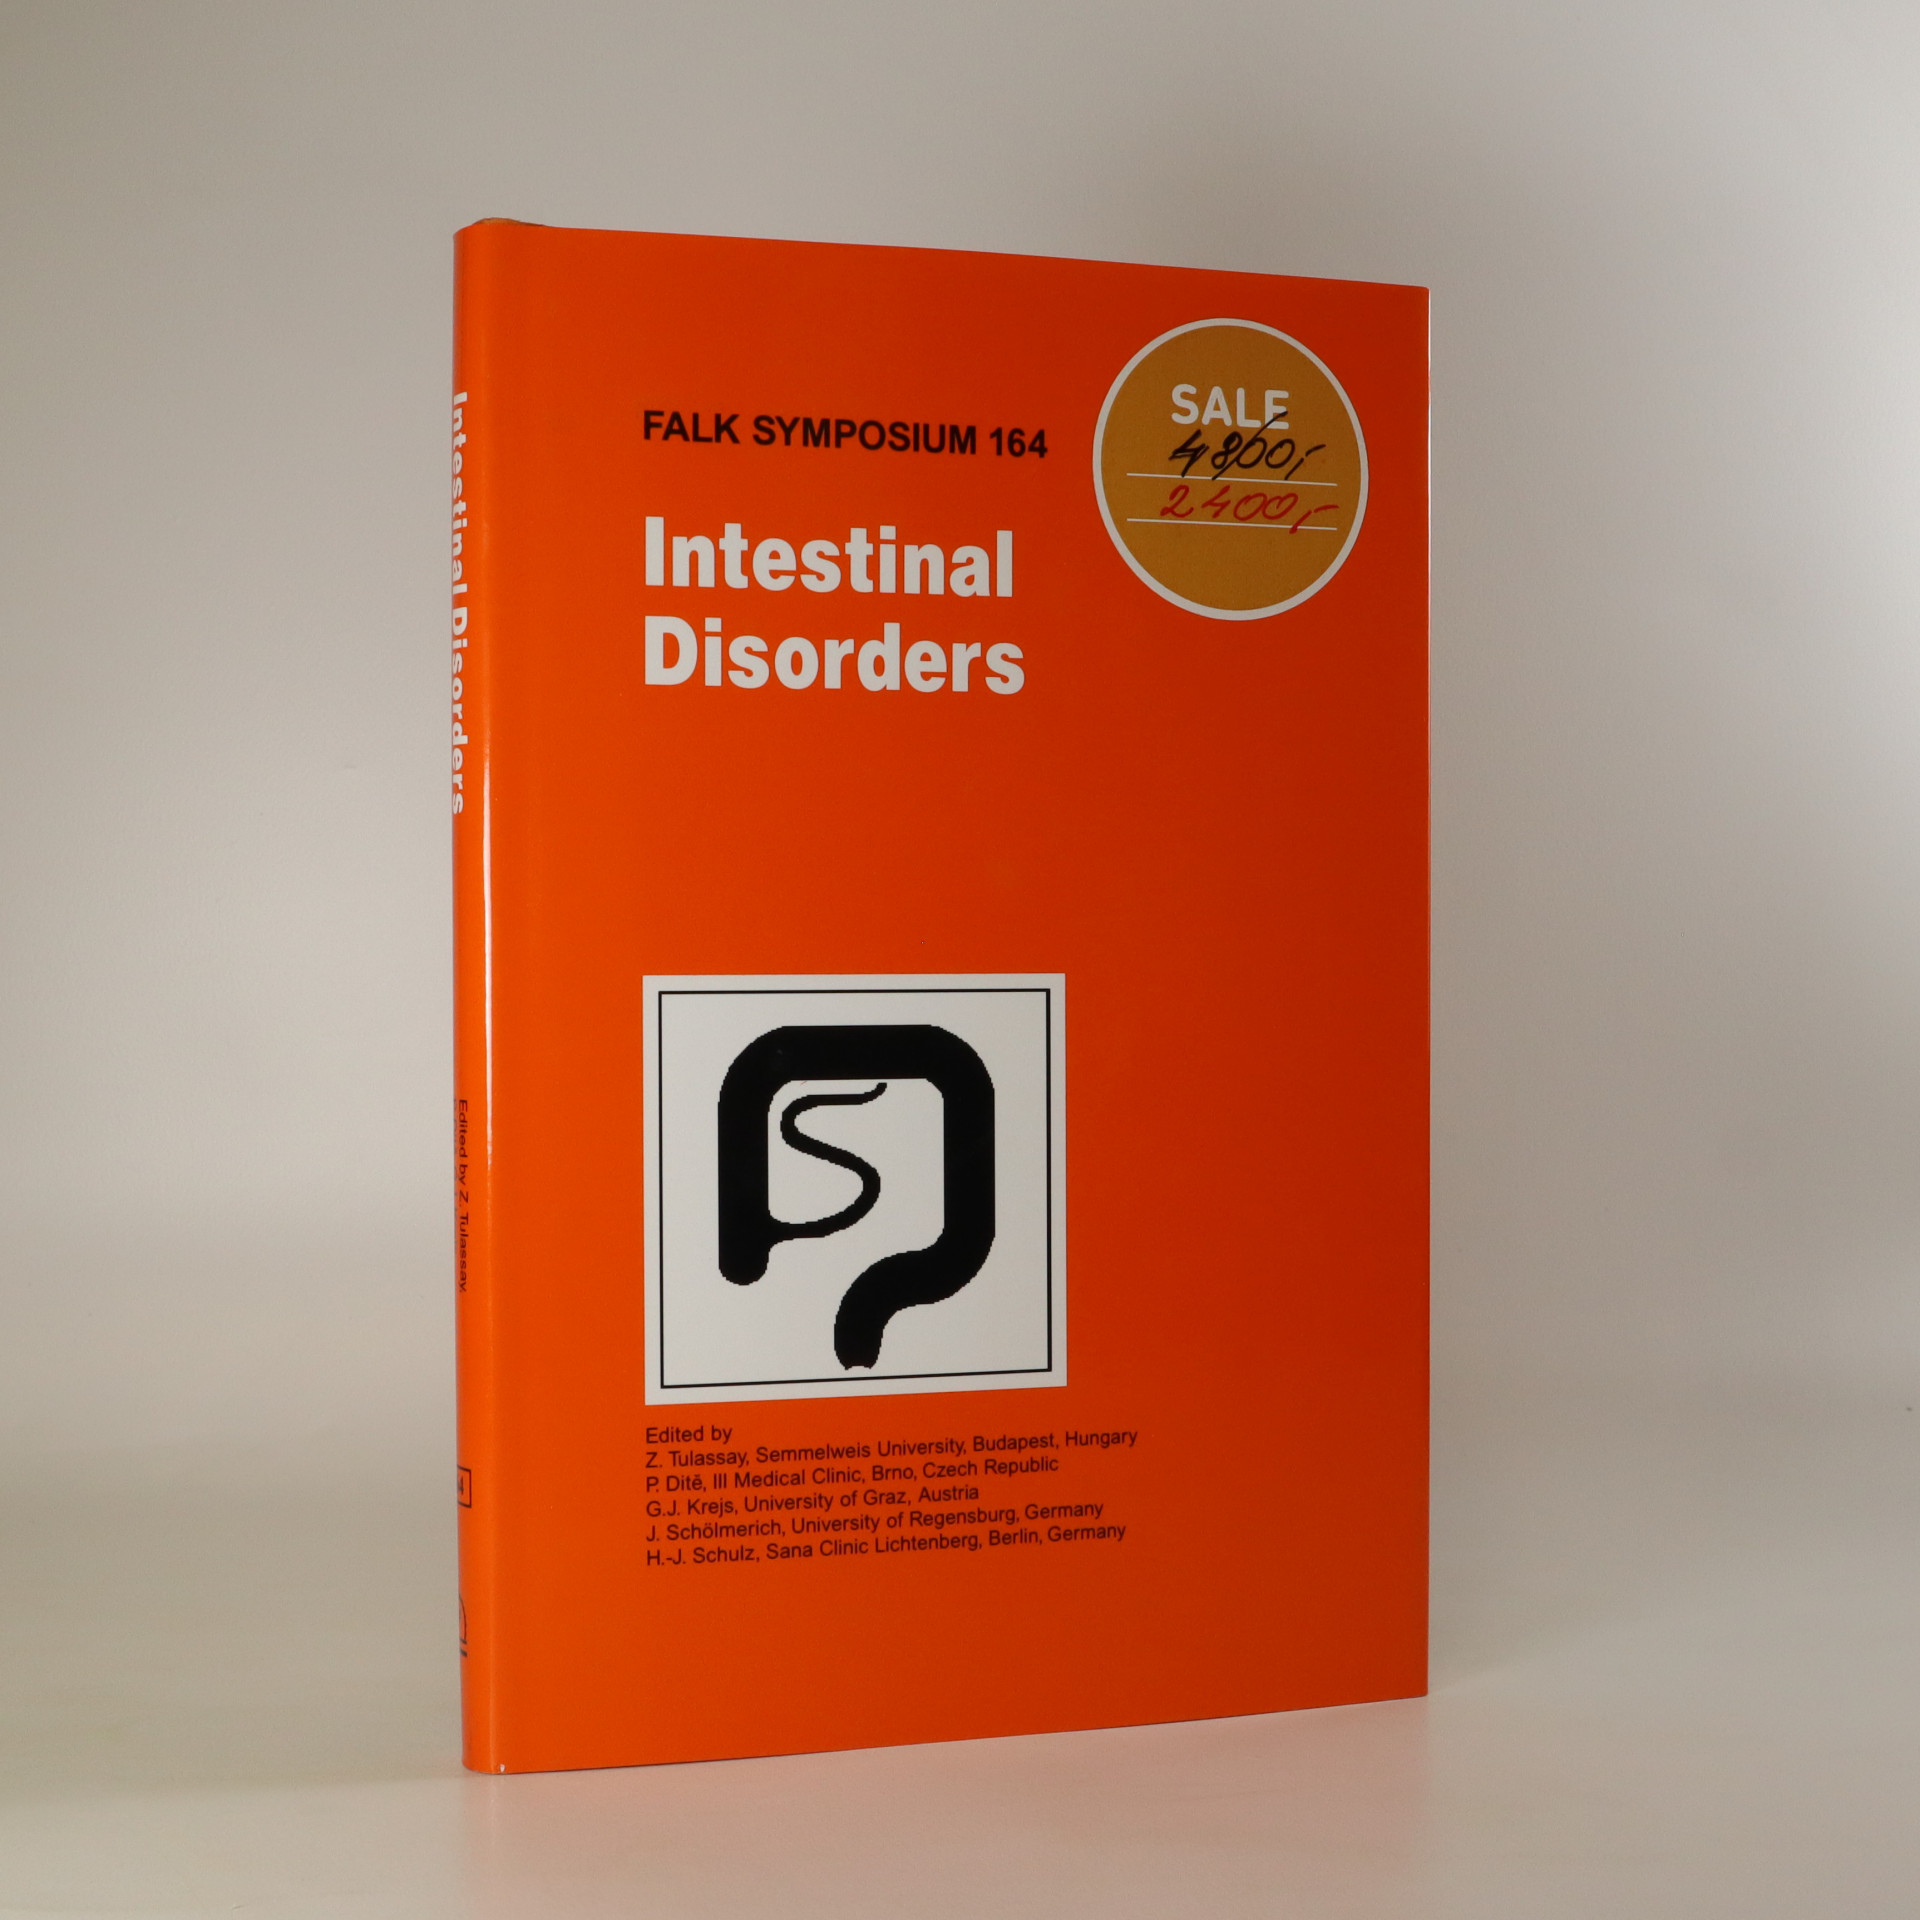 antikvární kniha Intestinal Disorders, neuveden